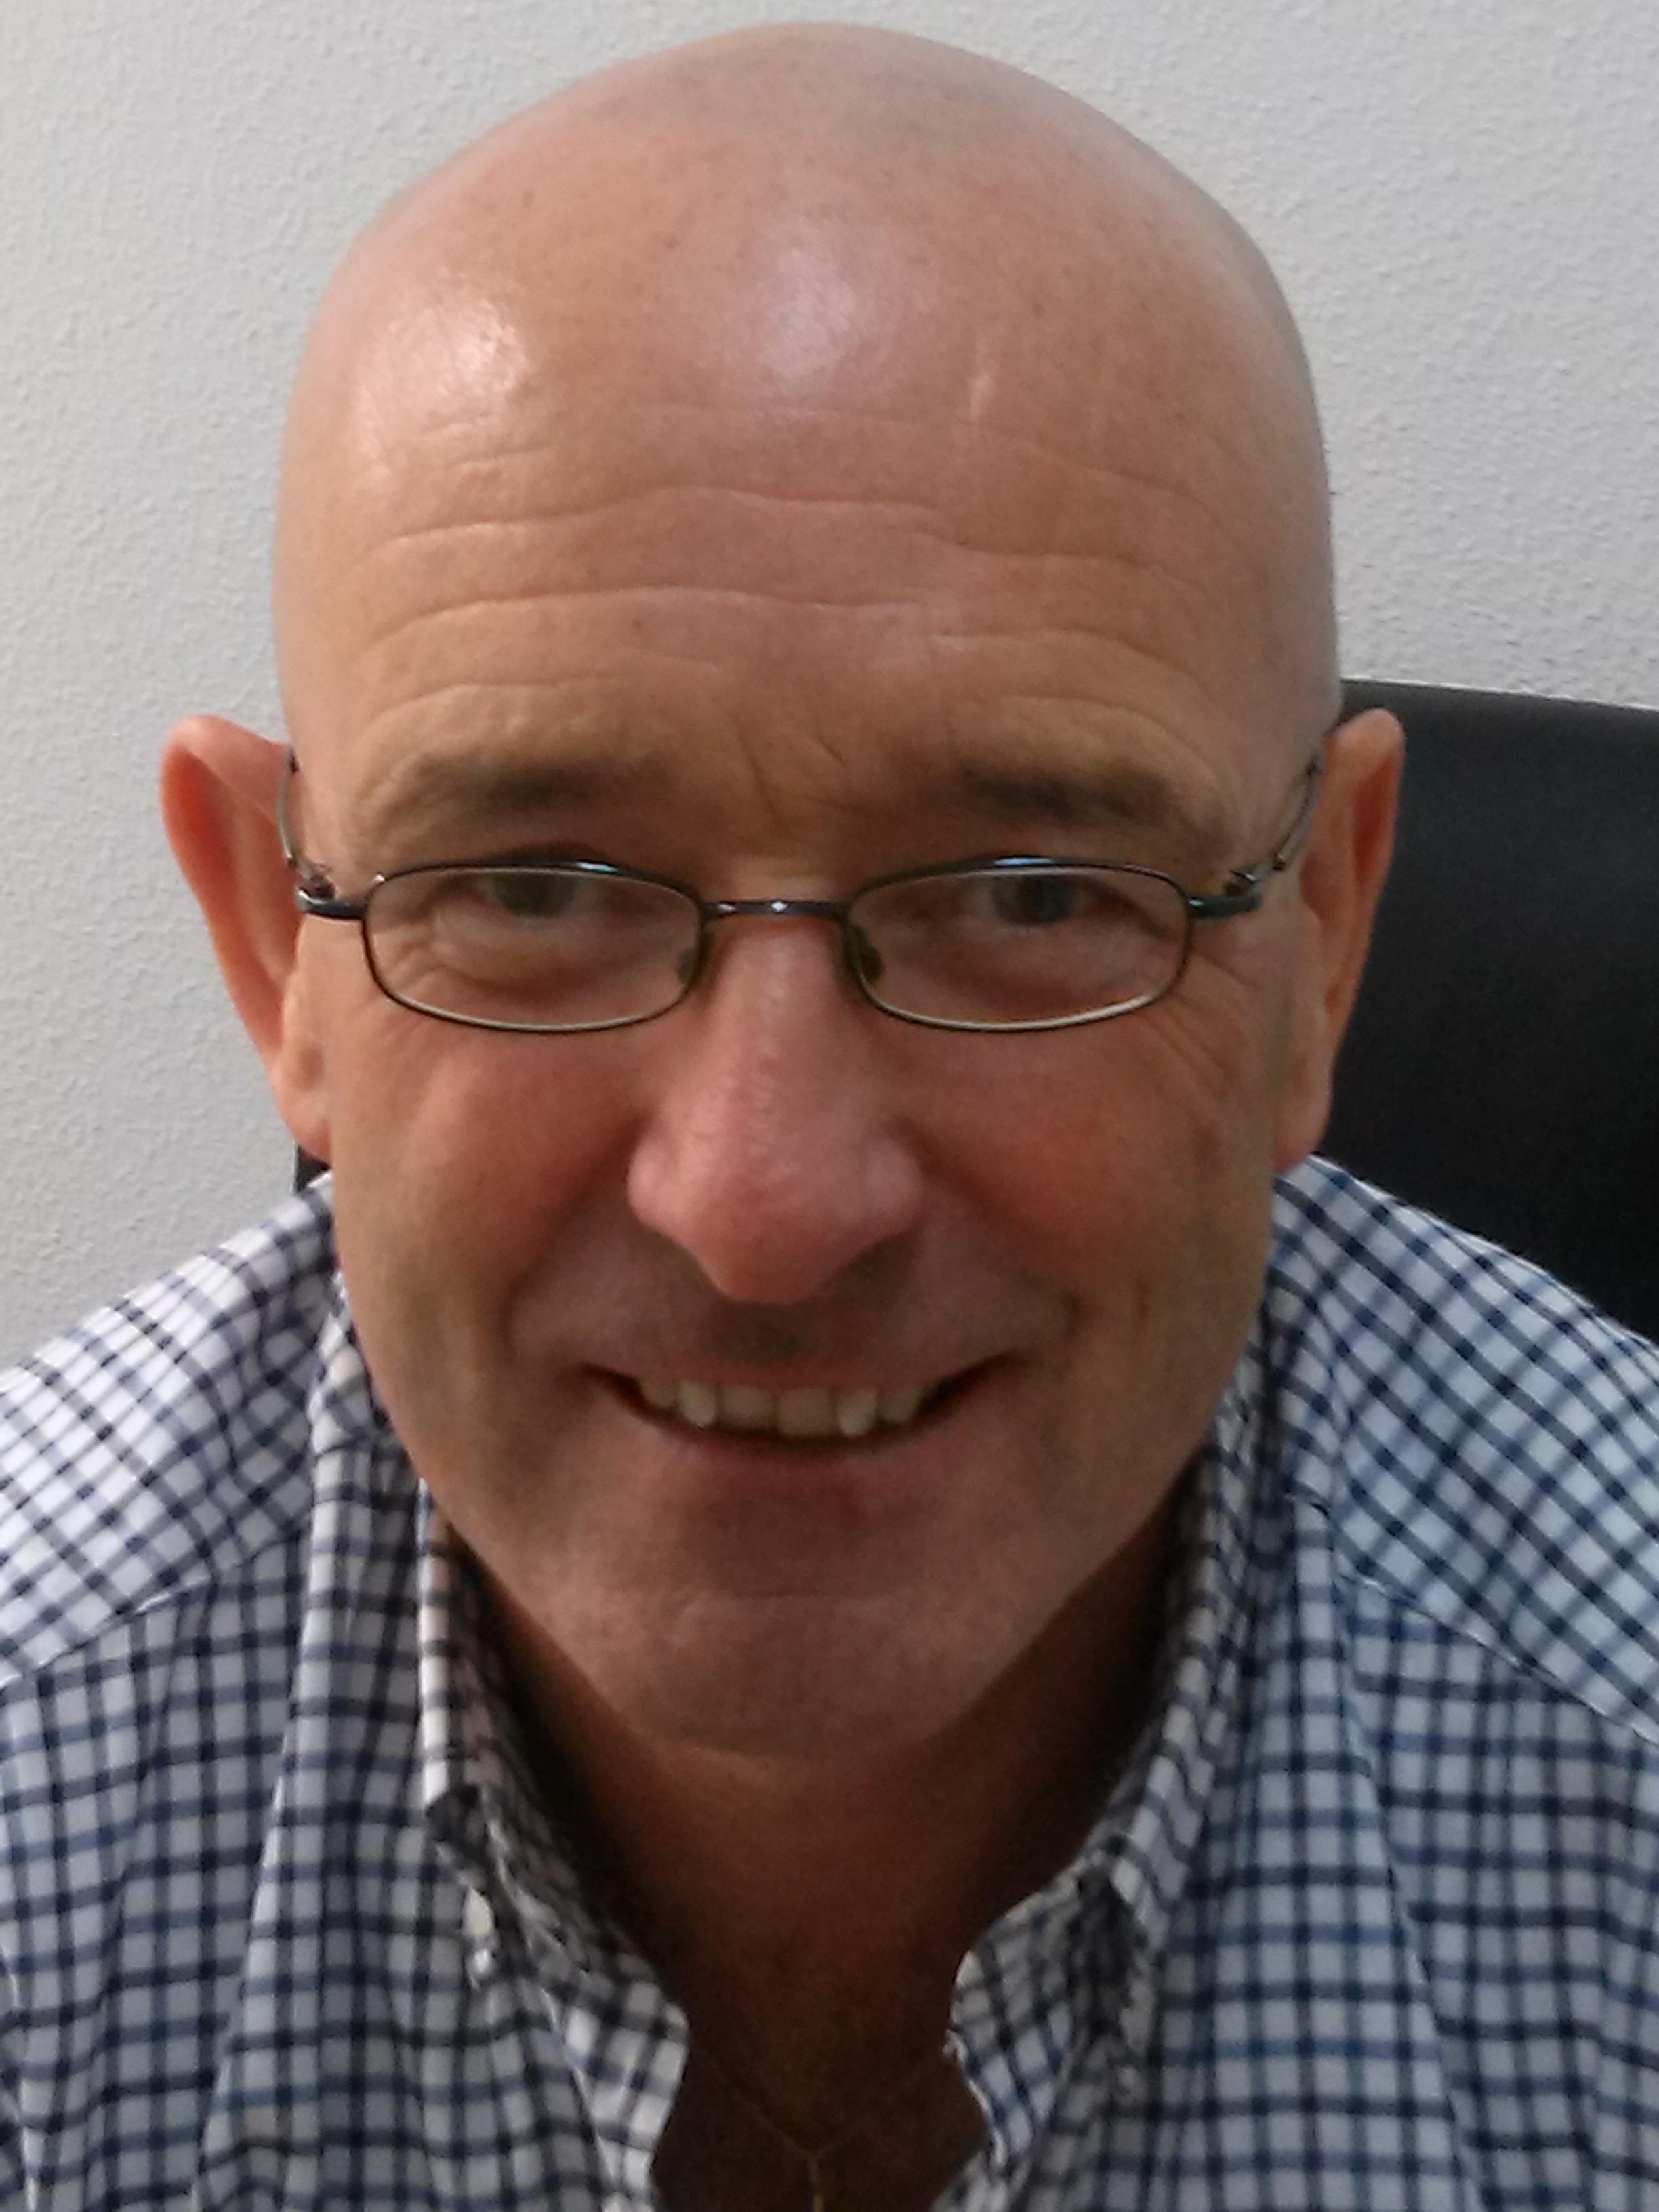 D. John Michael Doyle O Brien